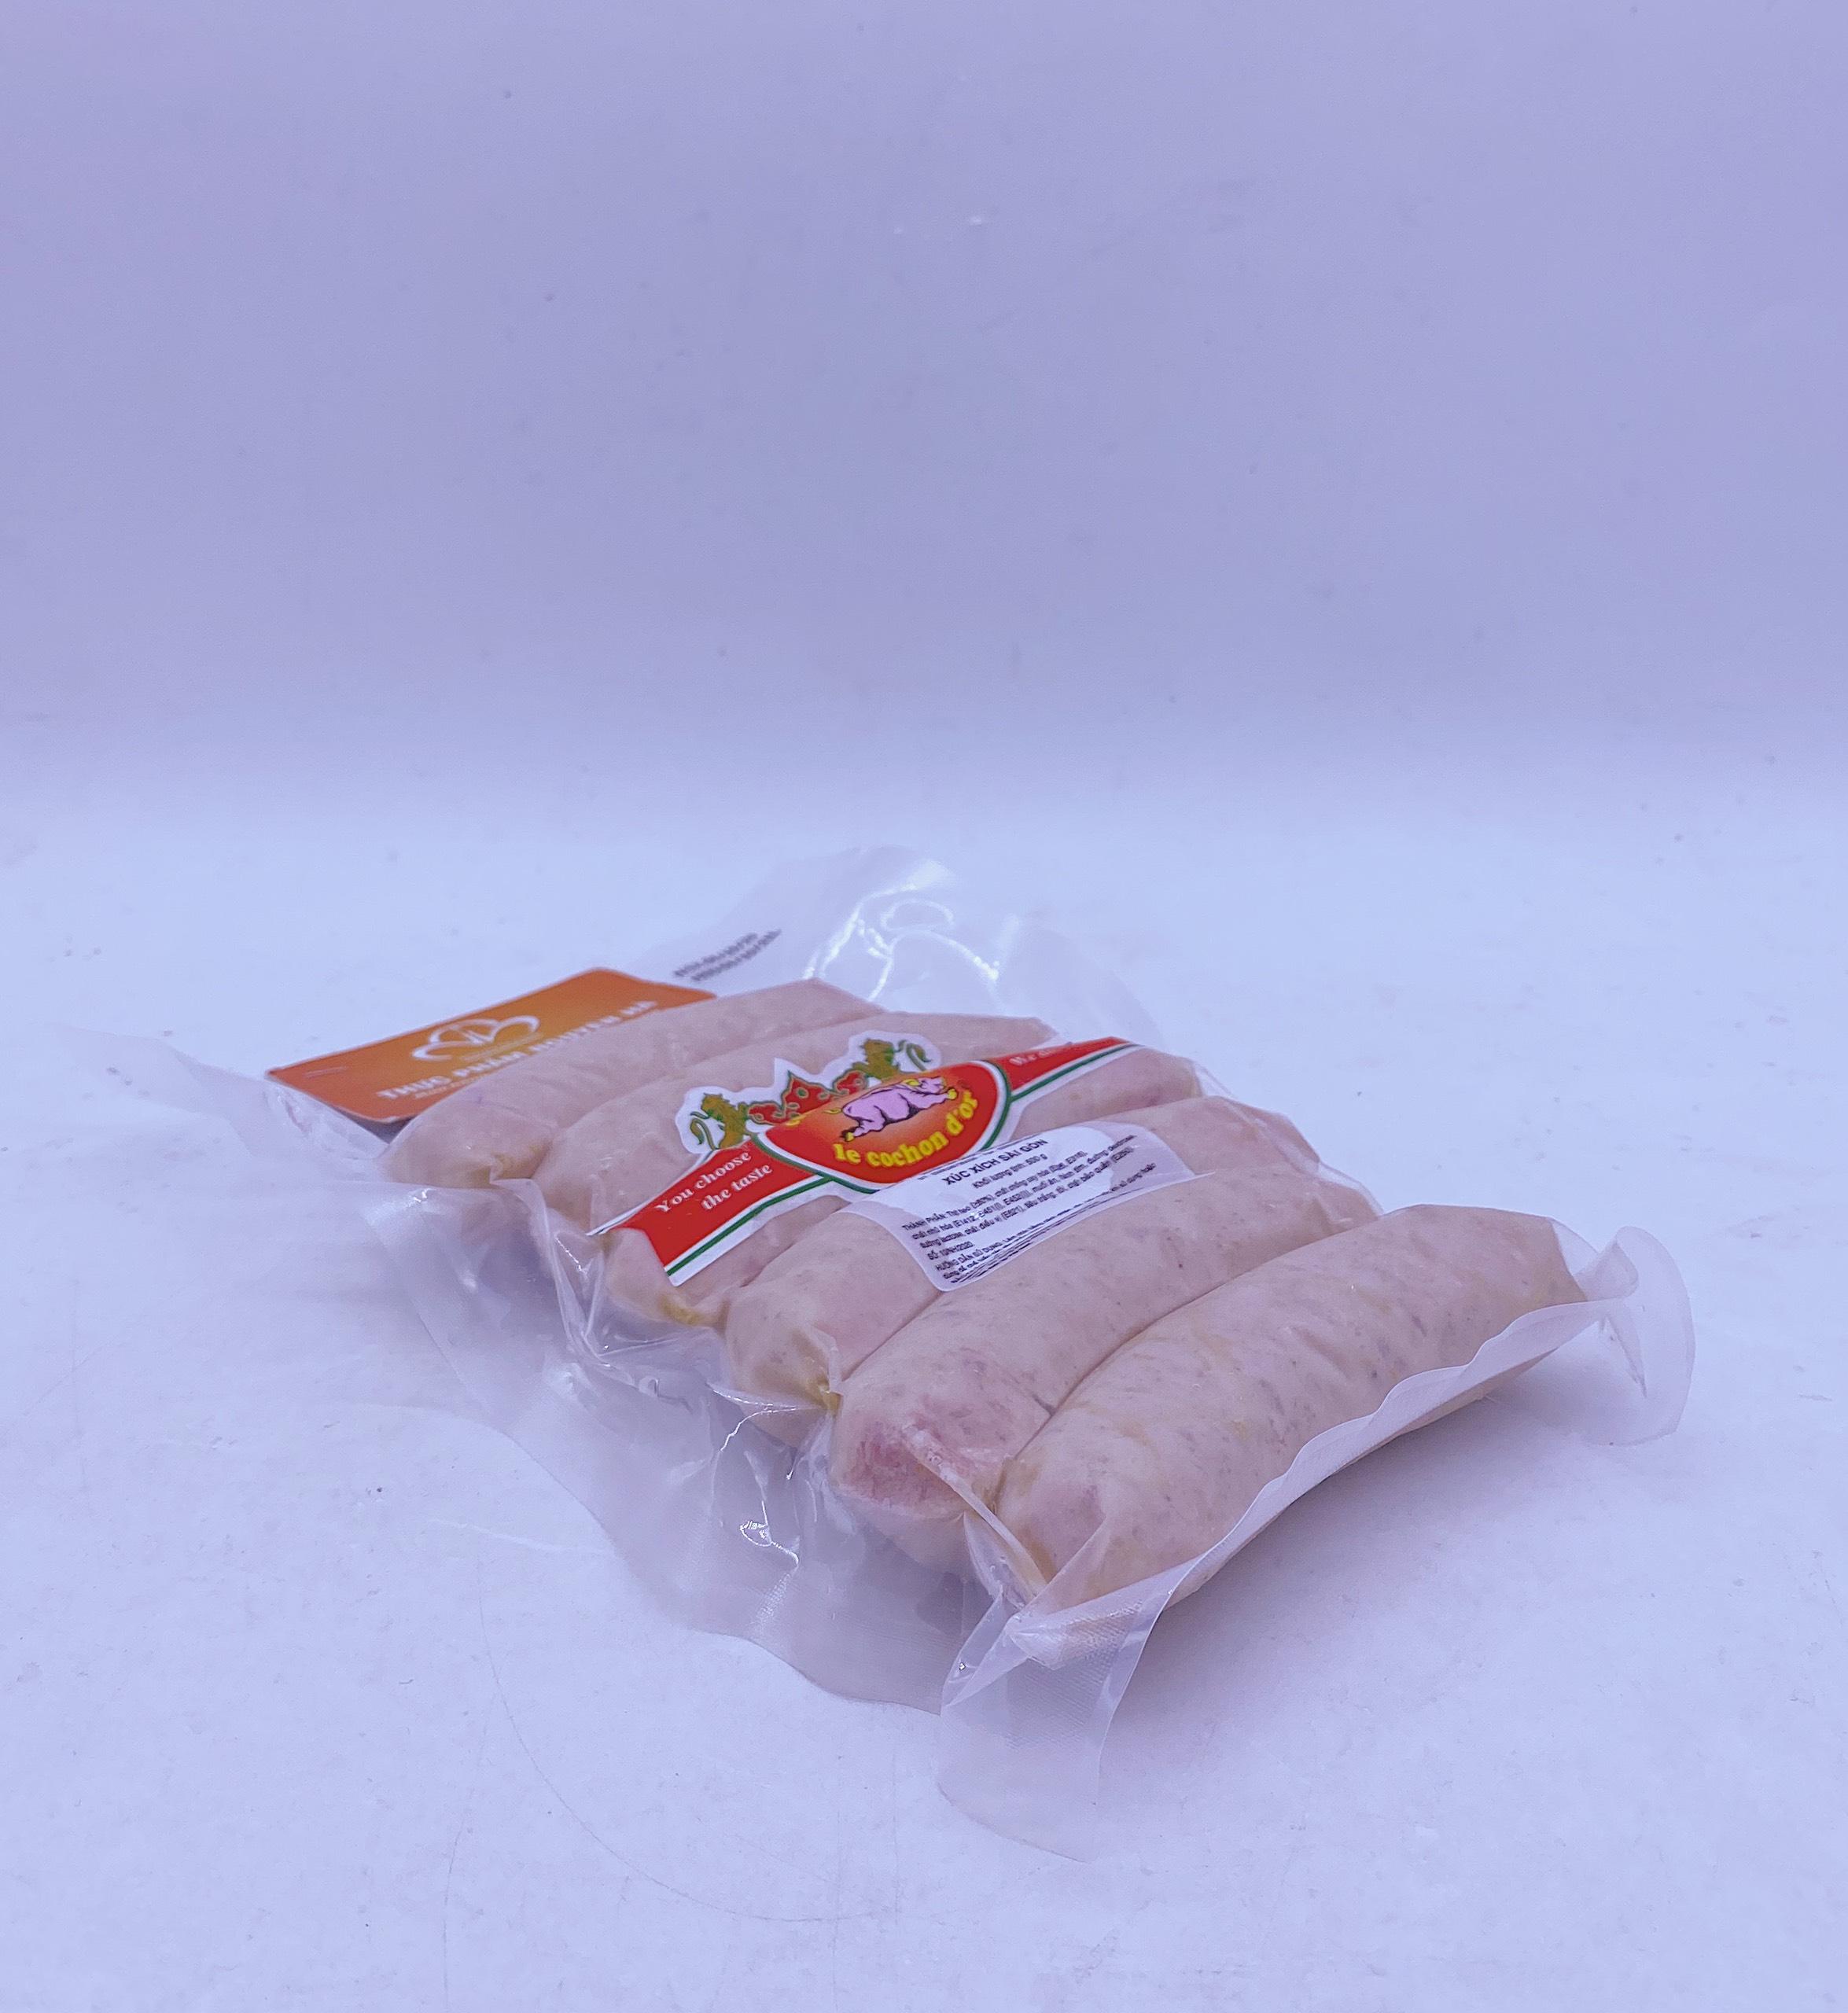 xuc-xich-sai-gon-con-heo-vang-nguyen-ha-food-2